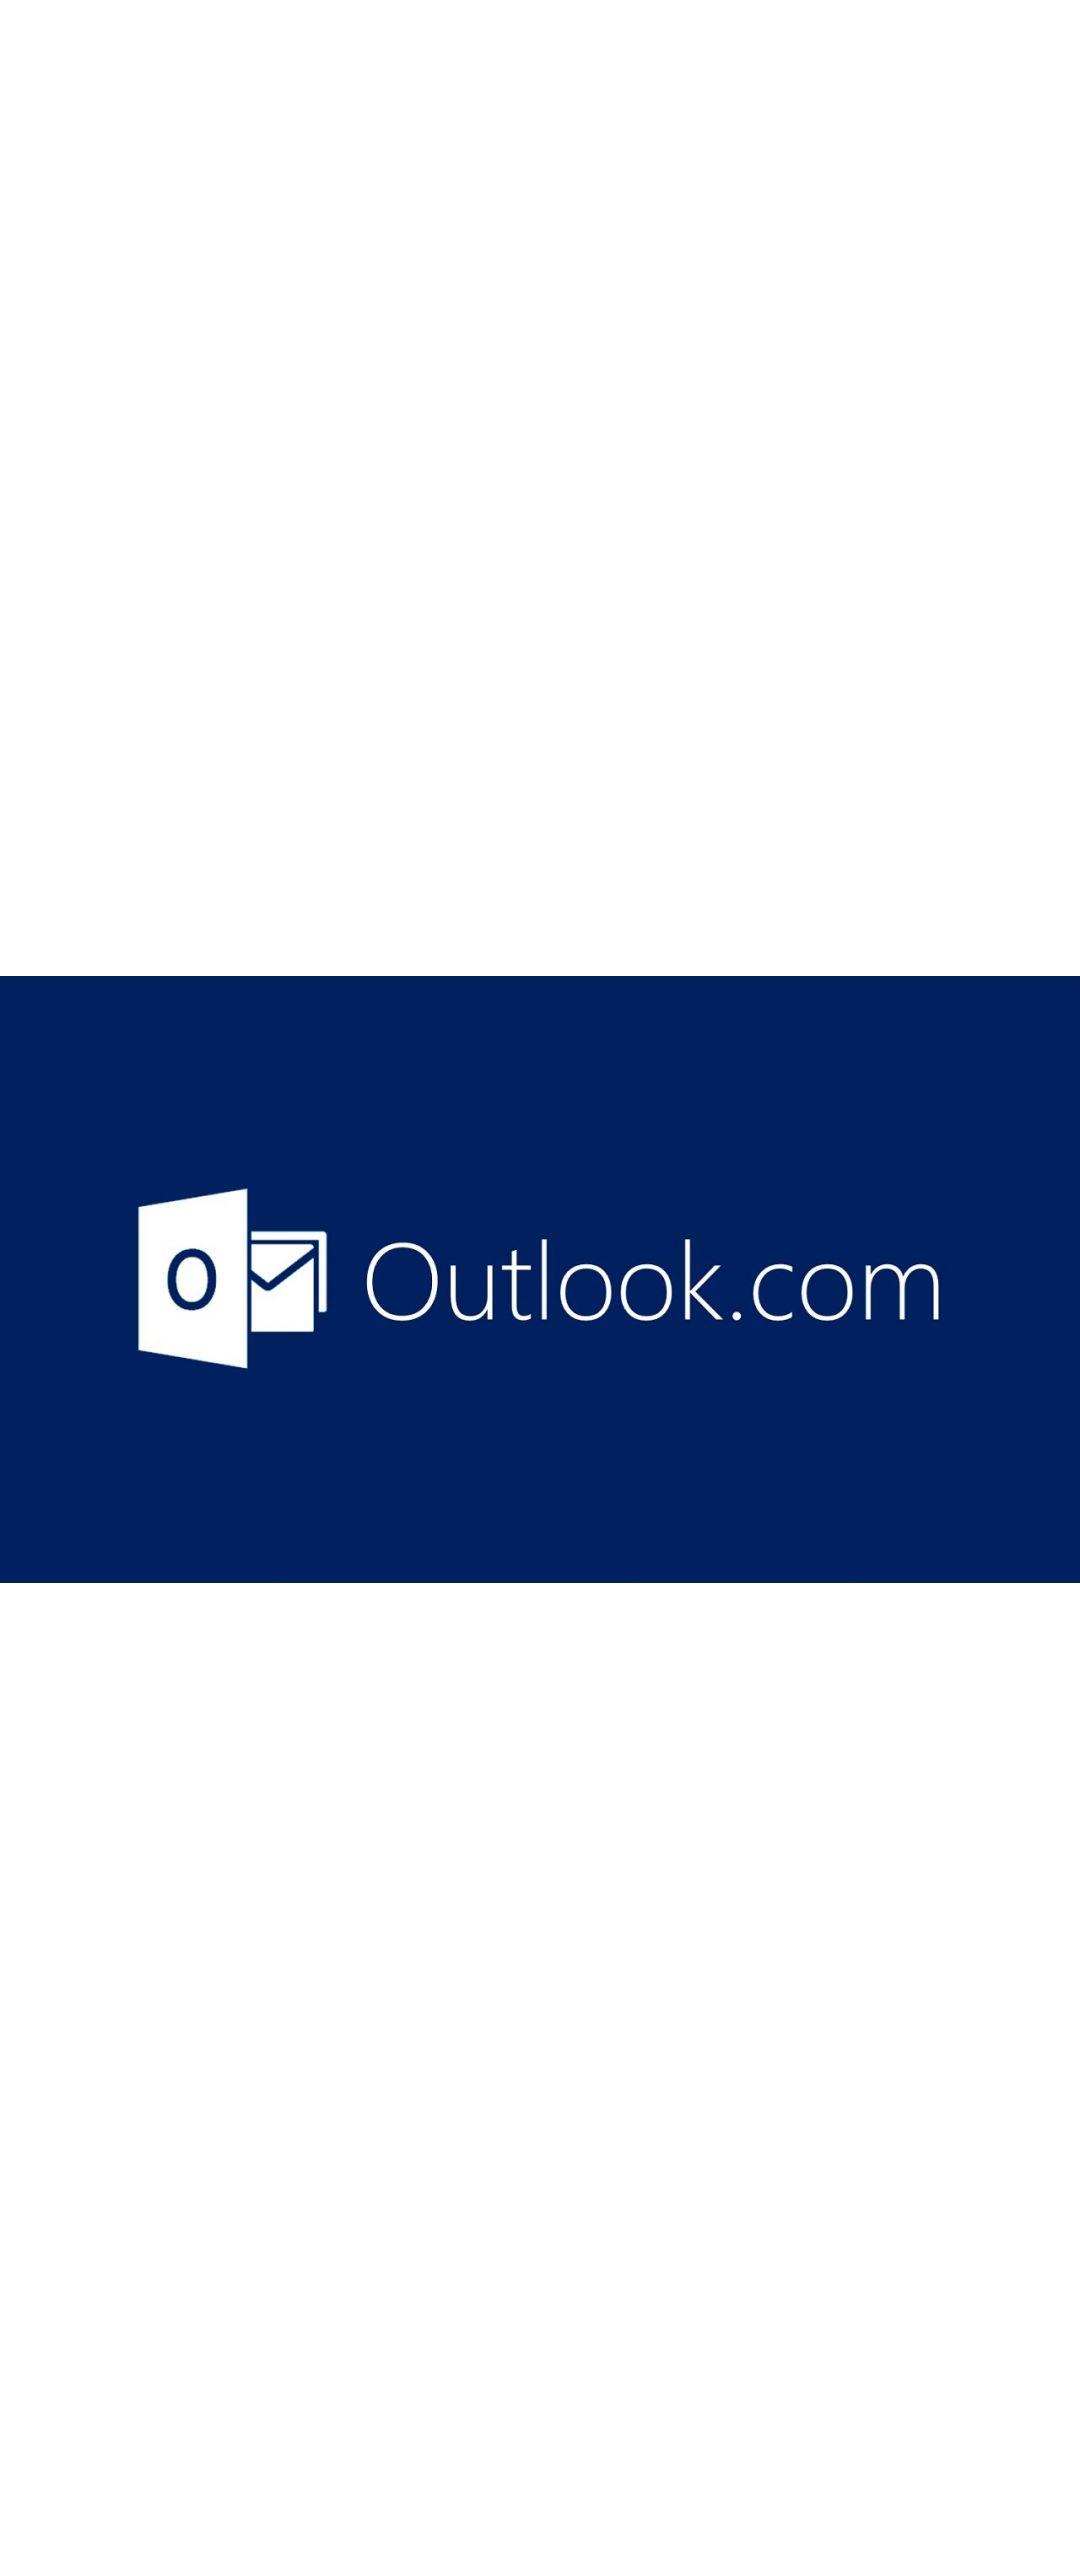 Outlook.com a�ade soporte para archivos de Google Docs en web